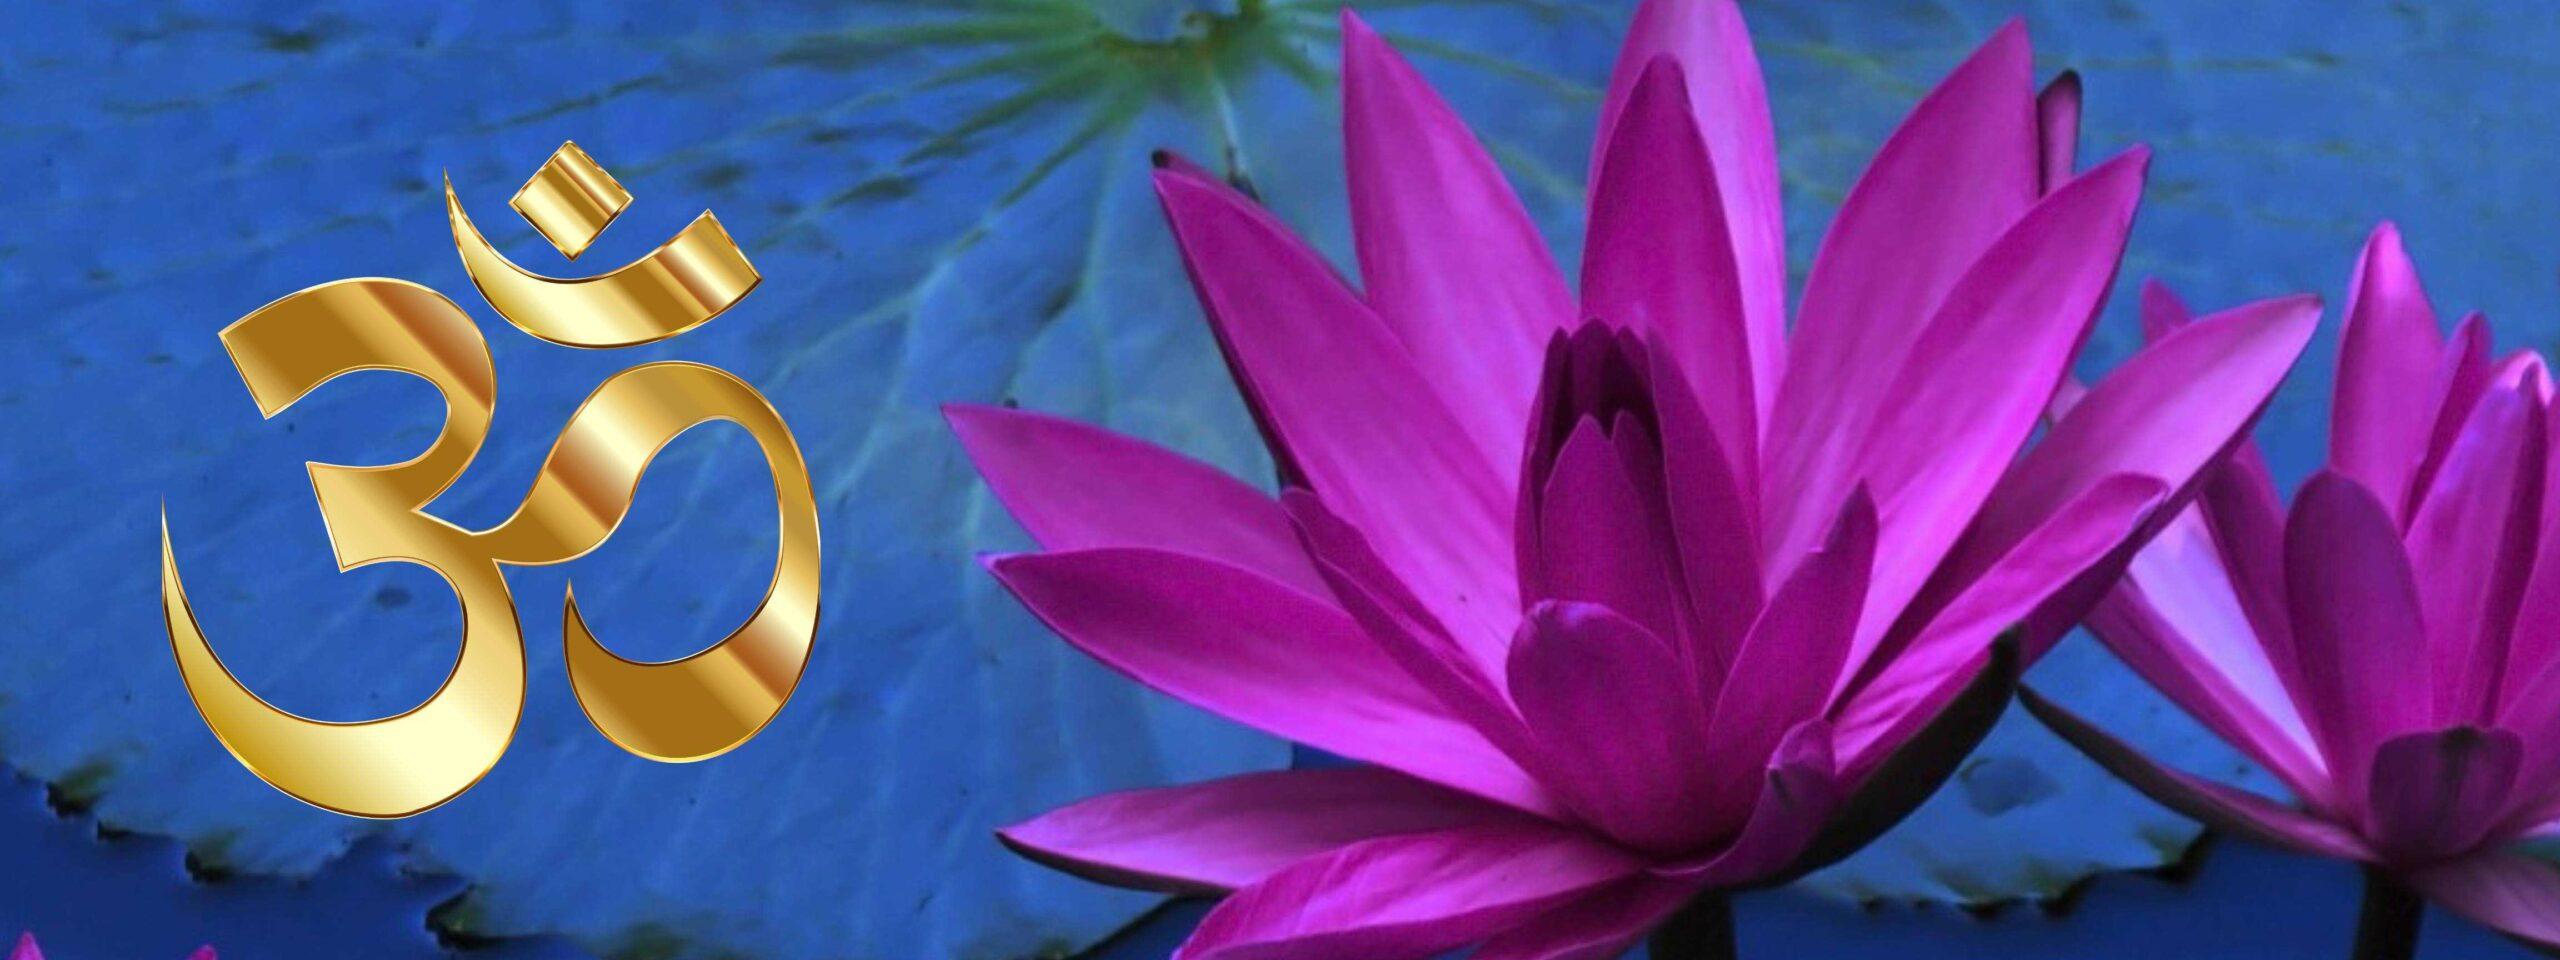 Lotusblume Violett mit goldenem OM